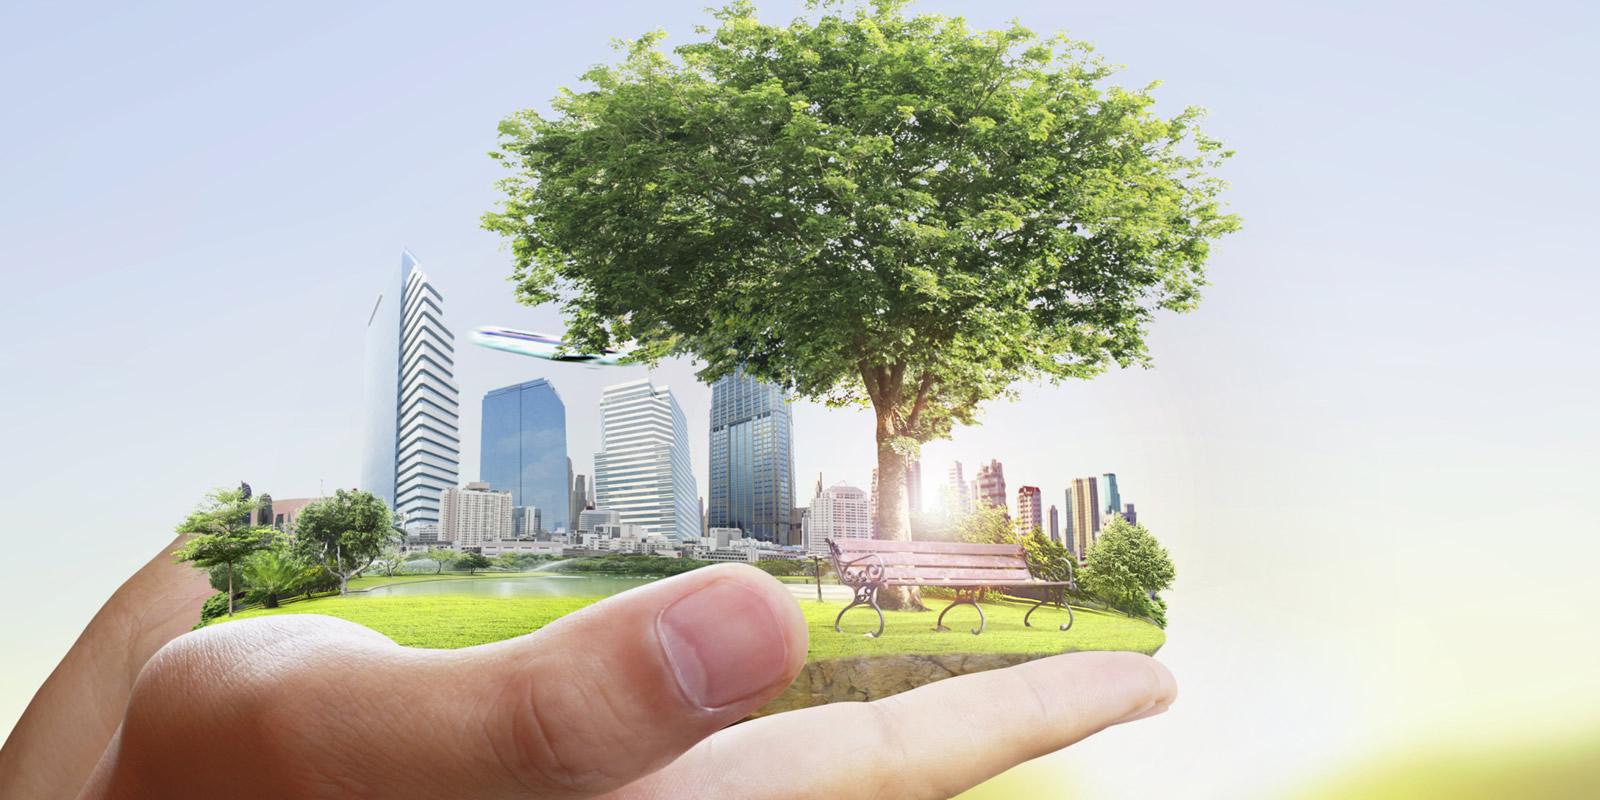 environoego - protect the planet